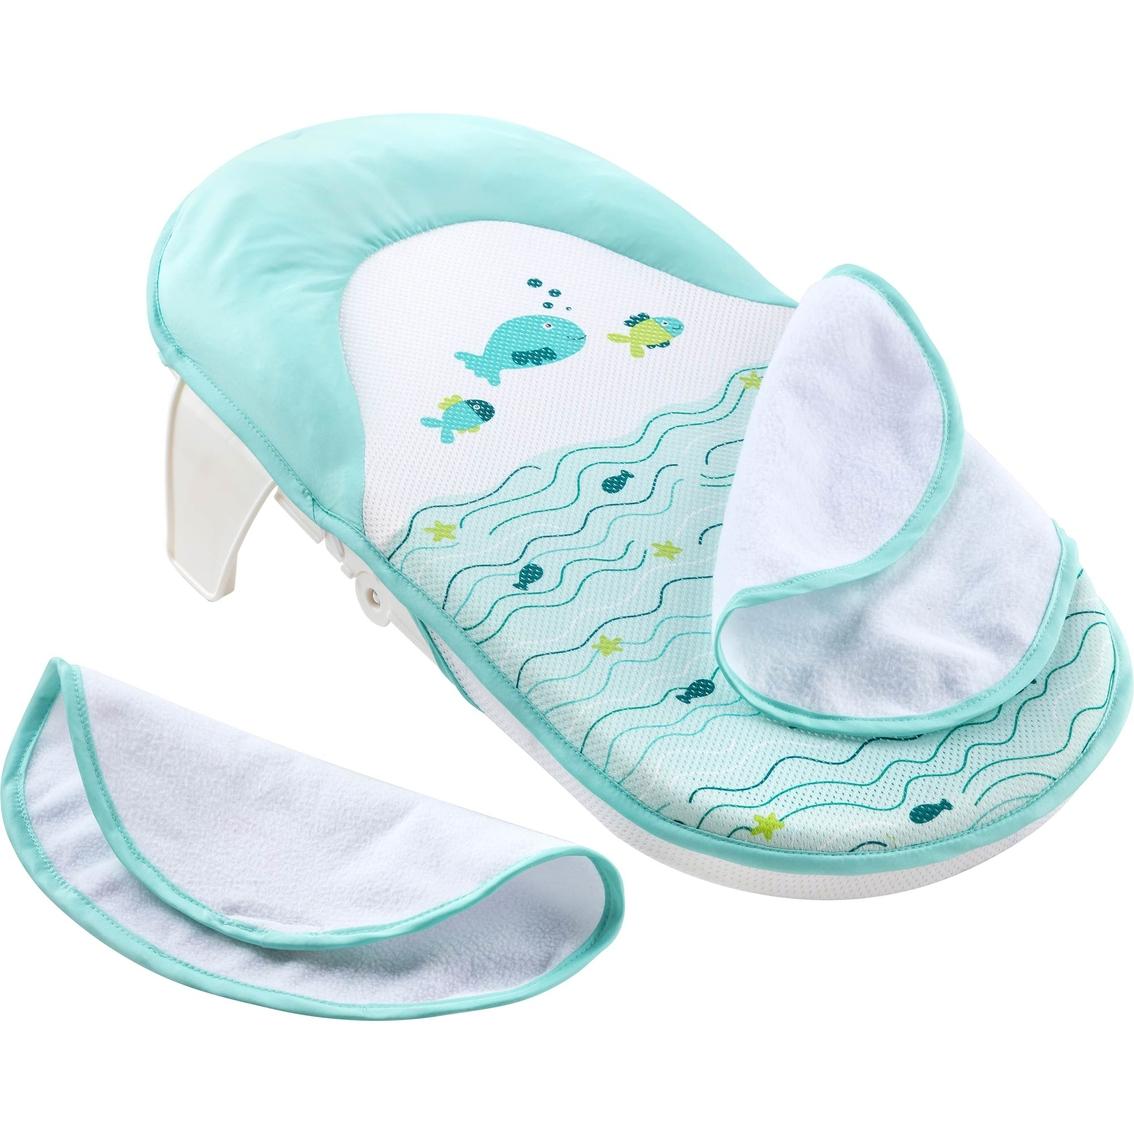 e9be4c890c2 Summer Infant Fold Bath Sling Warm Wings